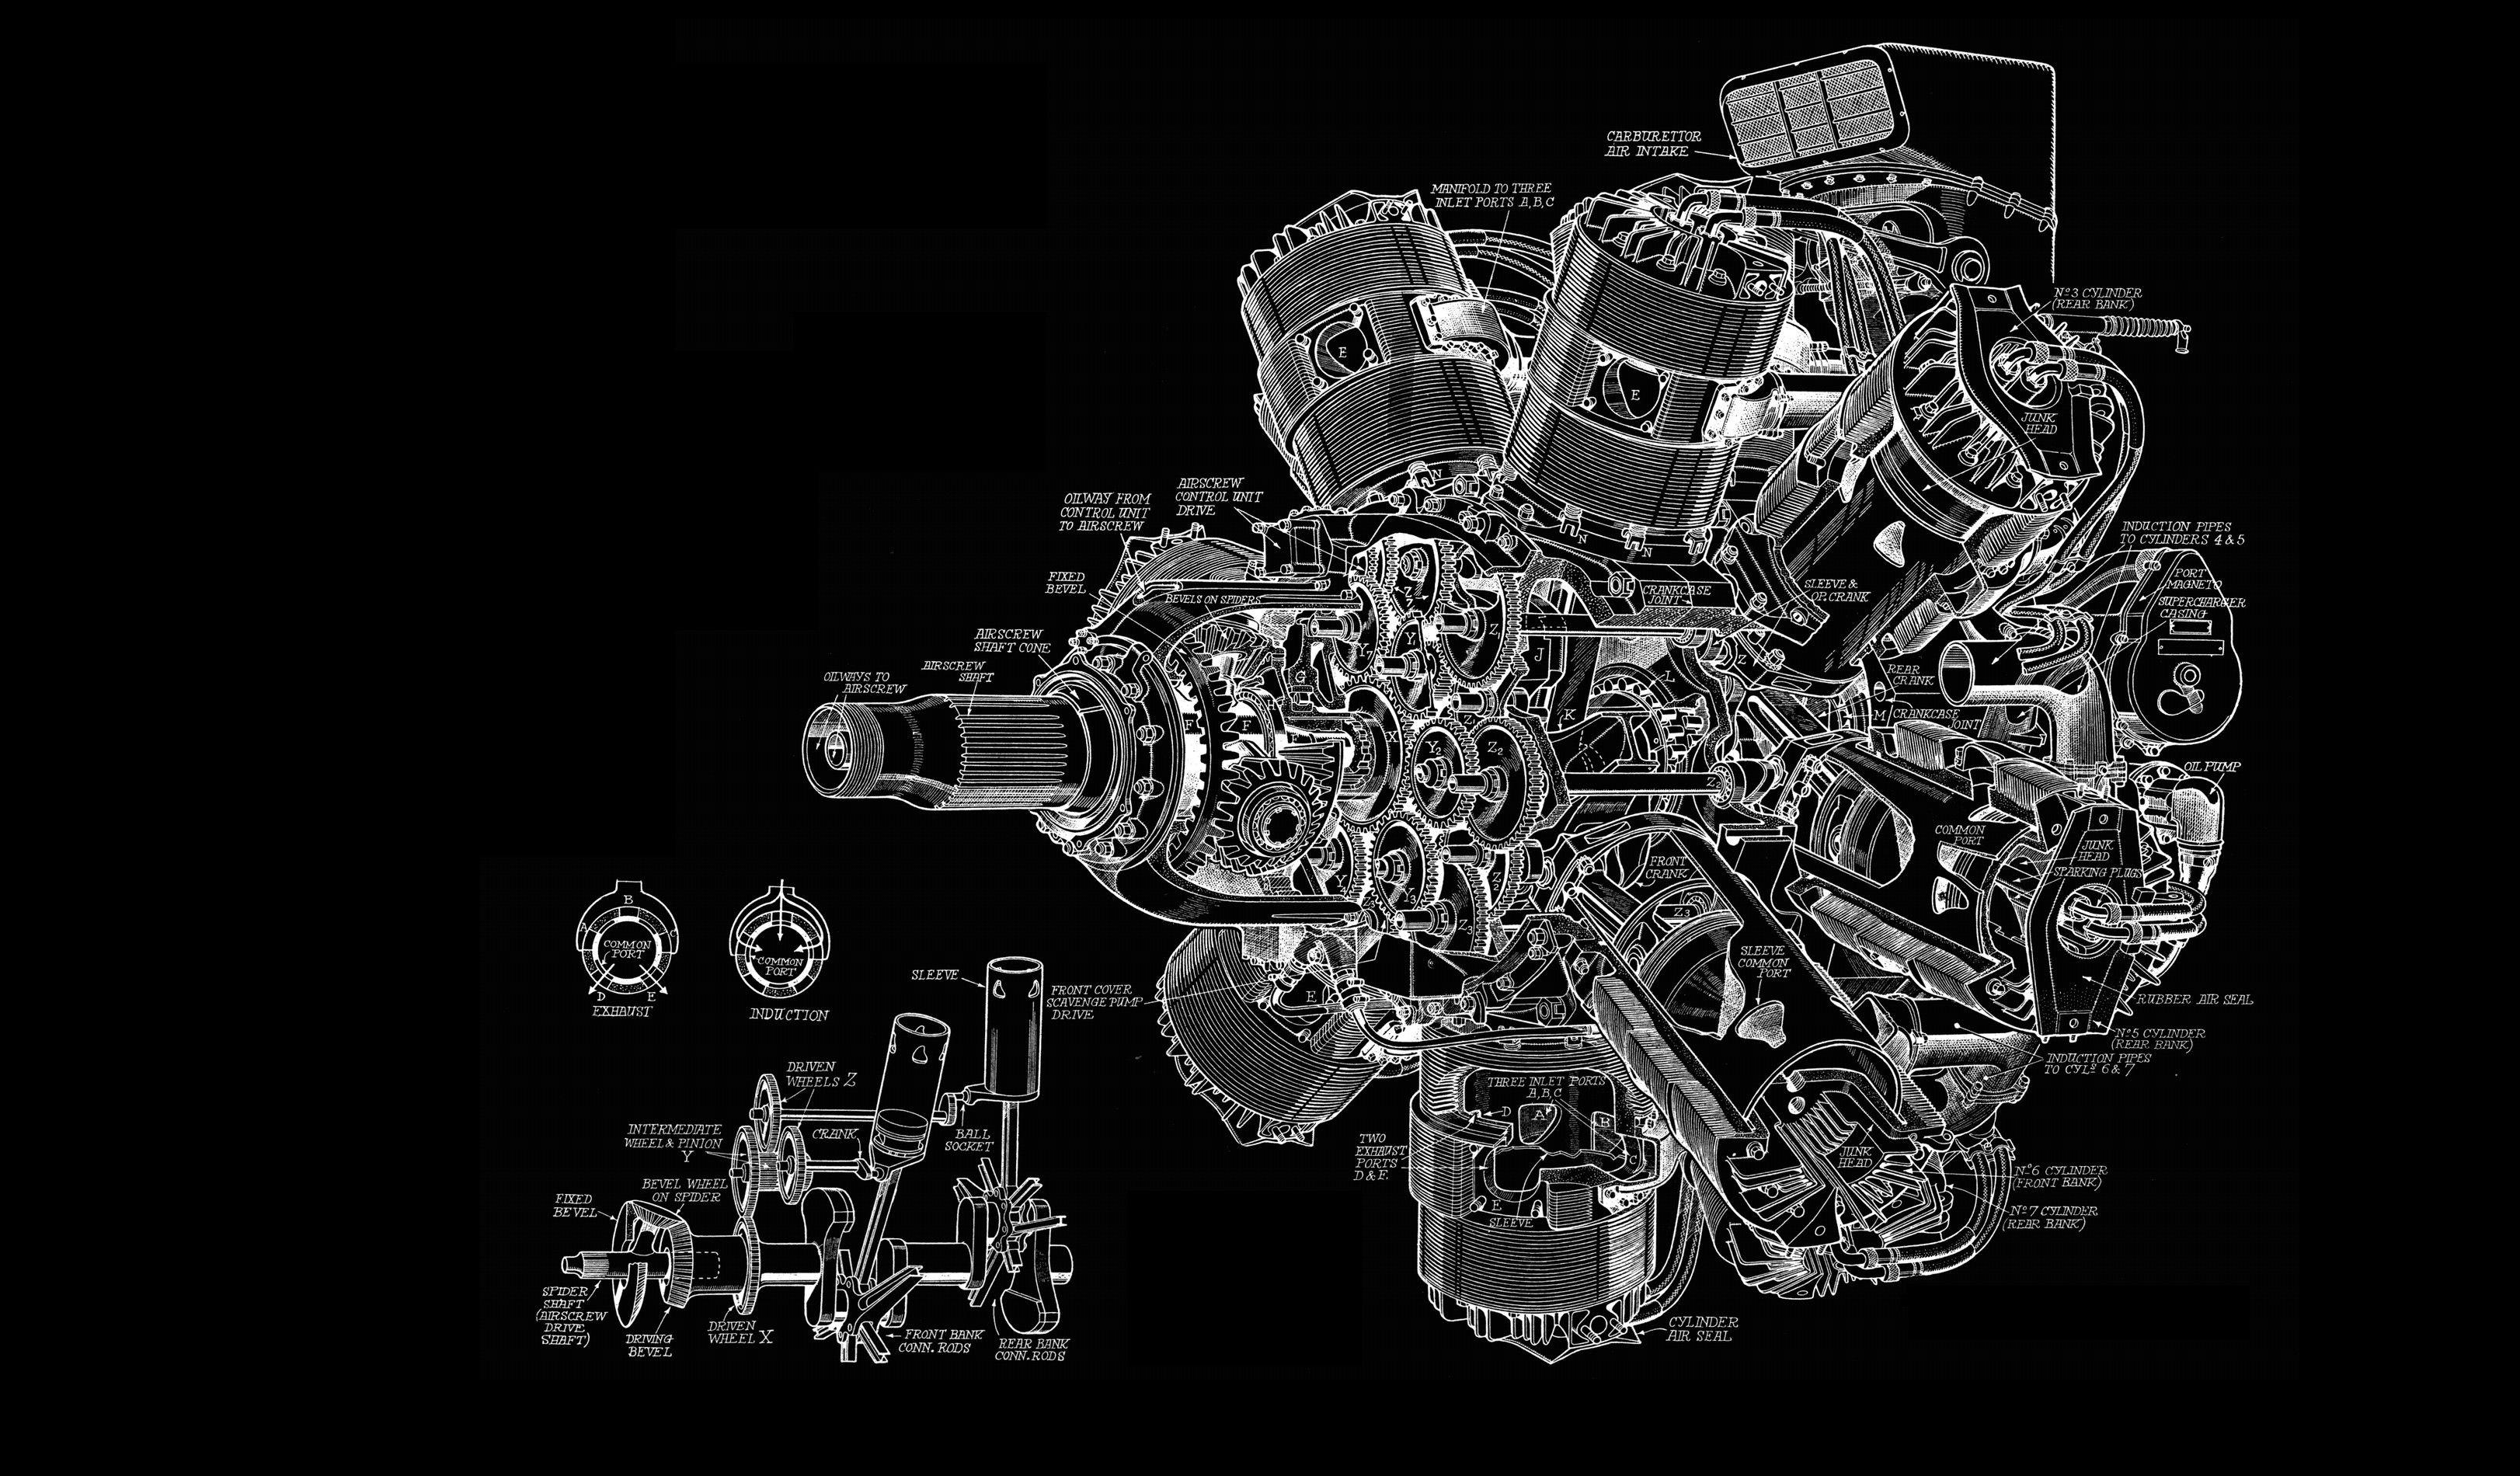 medium resolution of 3244x1900 general 3244x1900 engines schematic airplane sketches engineering turbine gears